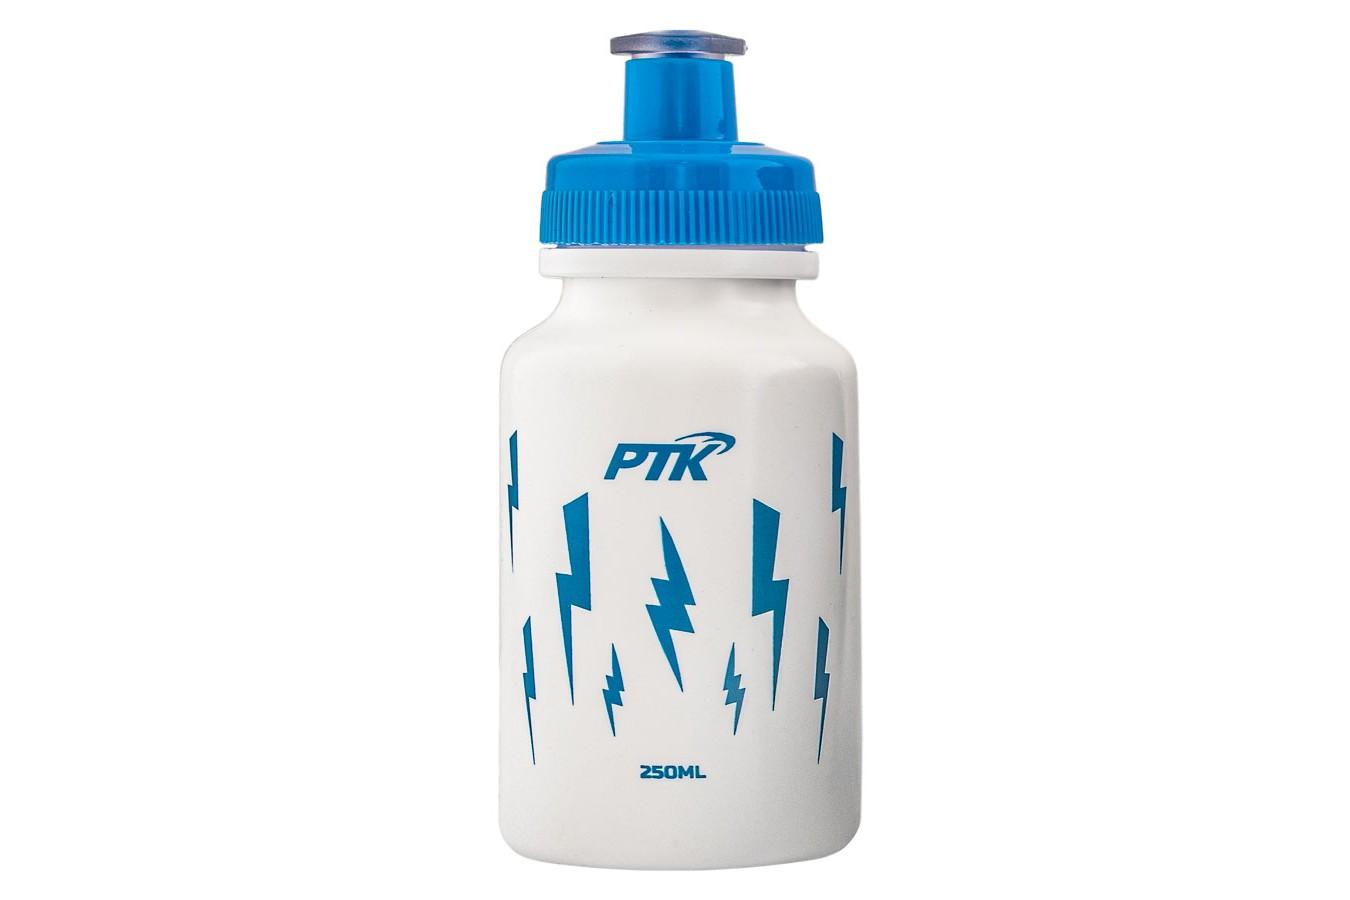 Capacete Ciclista Infantil com regulagem + Squeeze 250ml modelo Raio - PTK